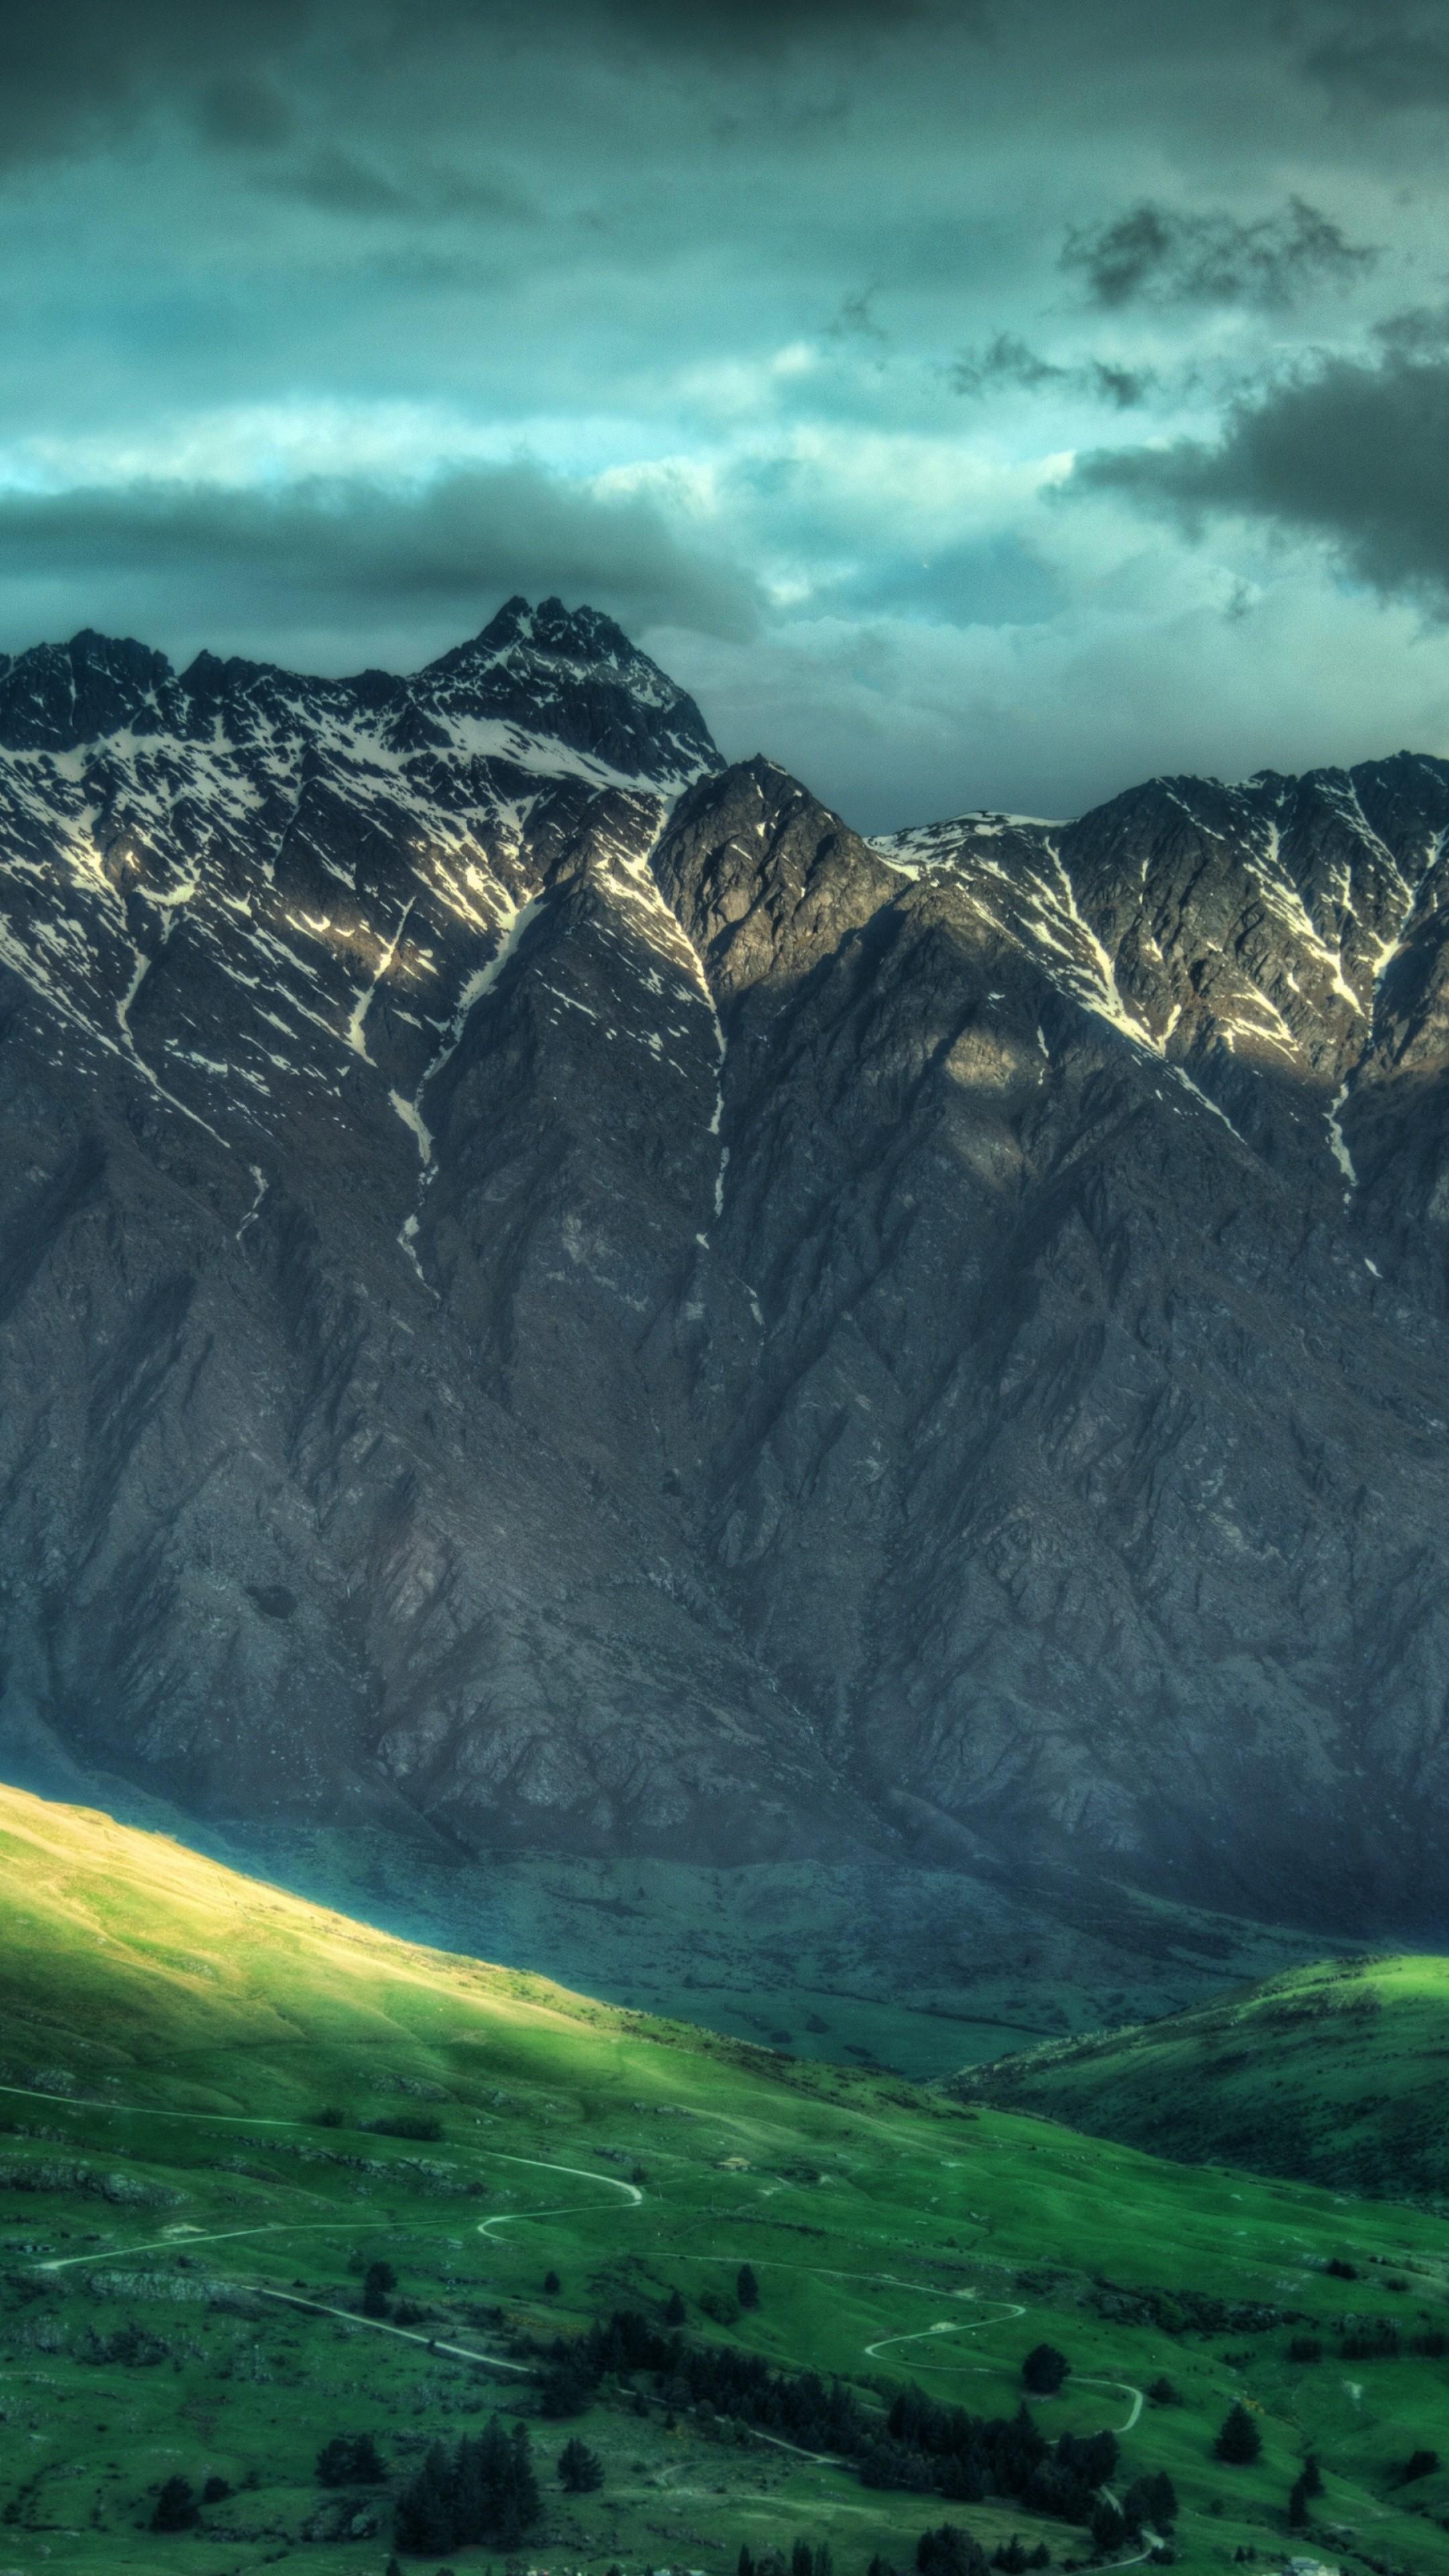 Fall With Water Wallpaper Wallpaper New Zealand 5k 4k Wallpaper 8k Mountain